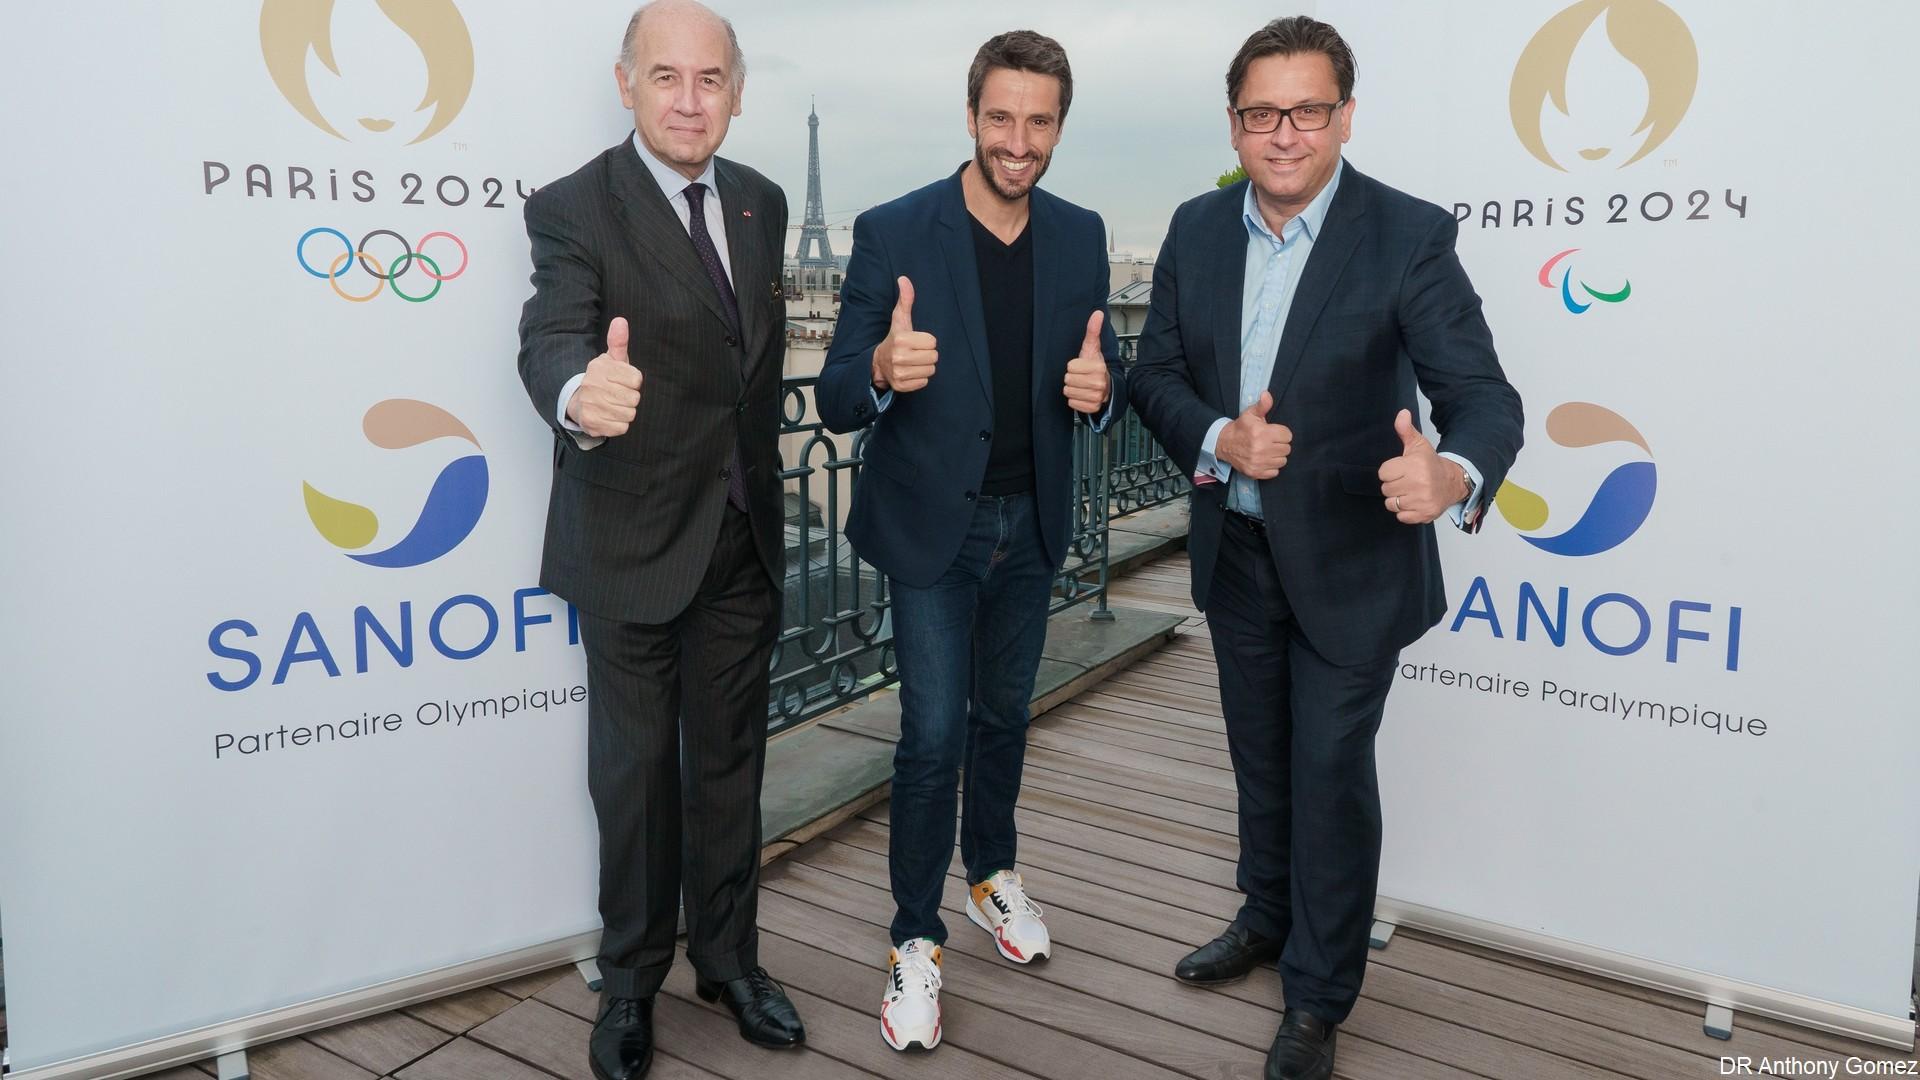 Sanofi x Paris 2024 (pharmacie) 2021